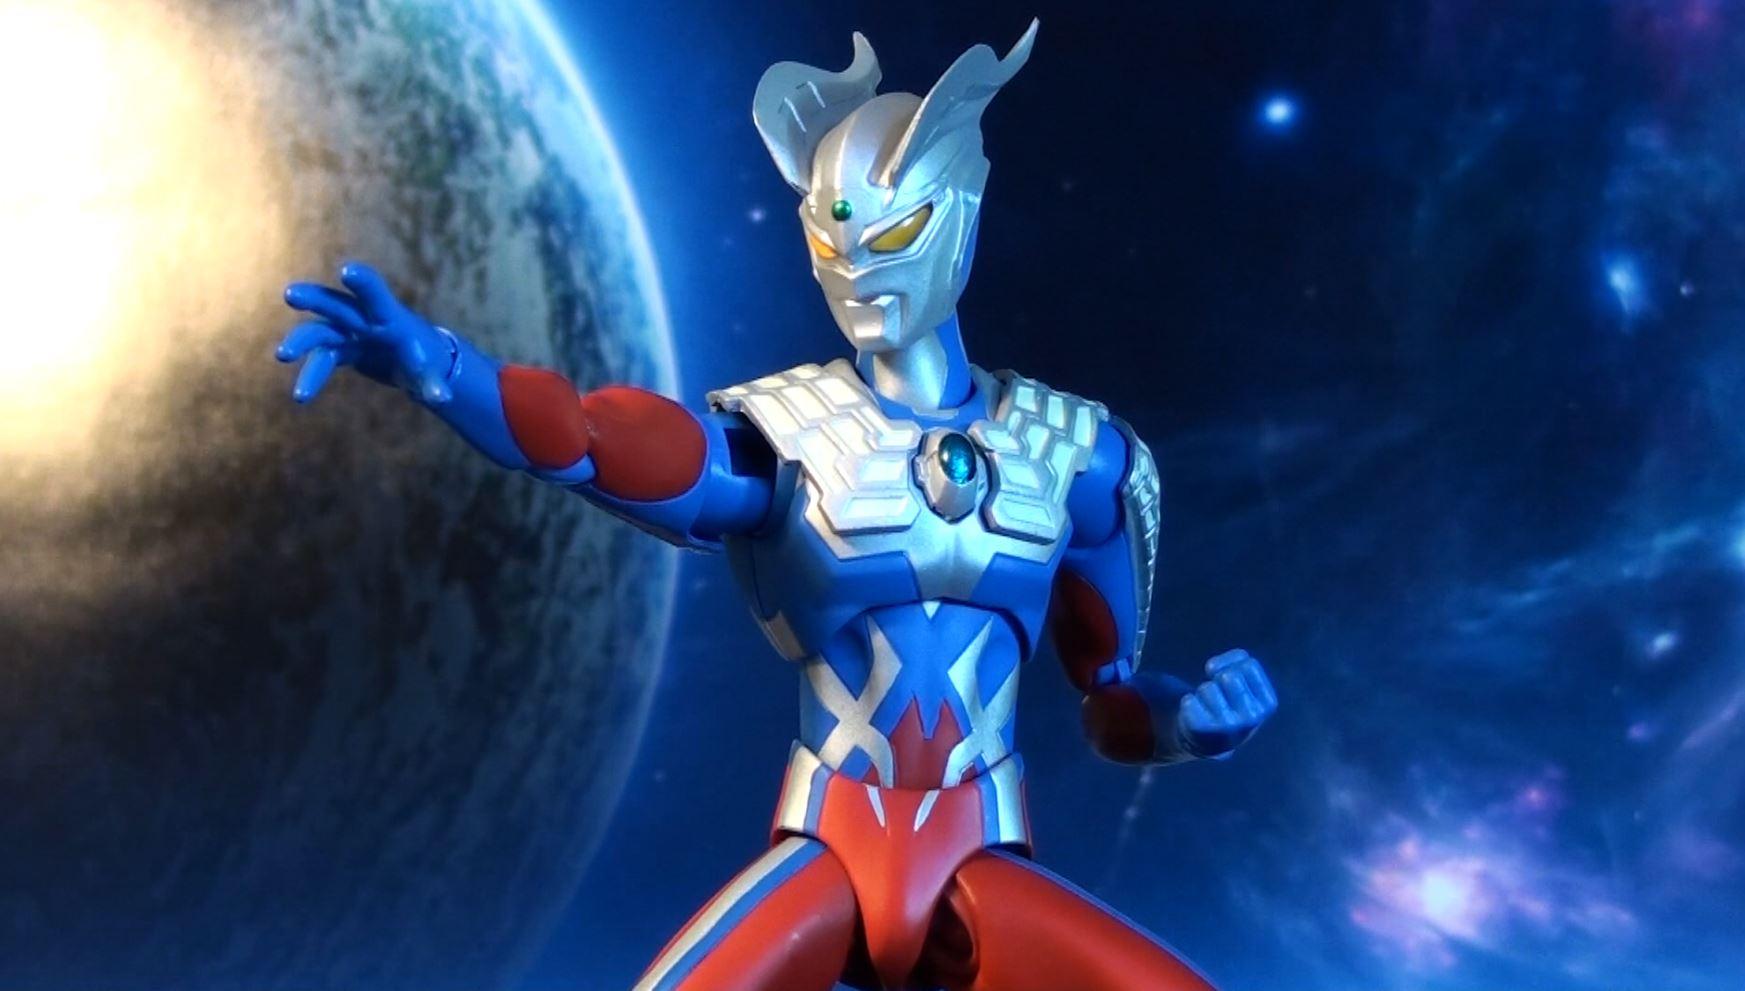 Ultraman Zero New Form Bandai Ultra-Act Ultraman Zero